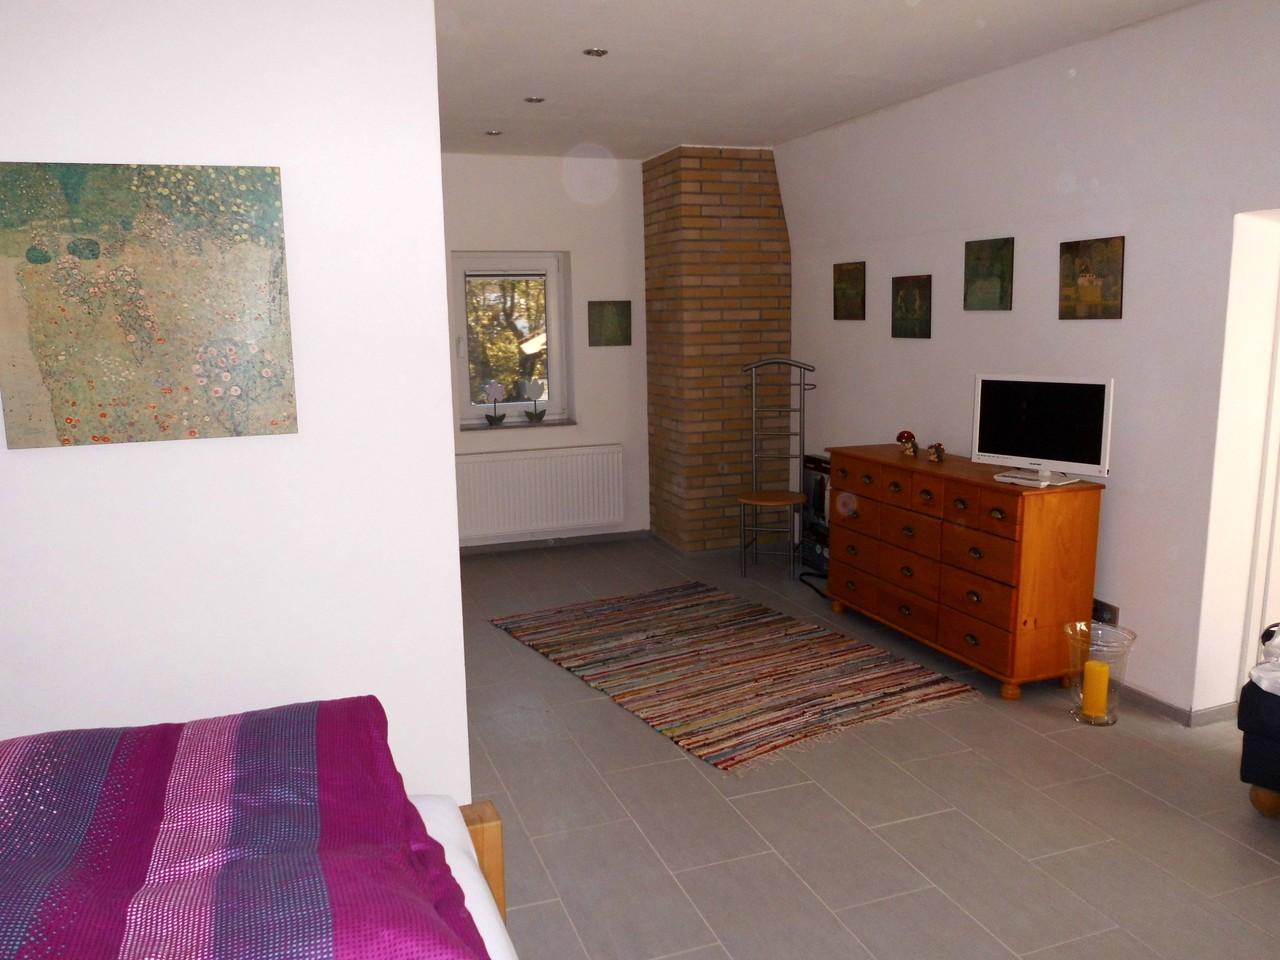 Obergeschoss - Galerie - Schlafbereich